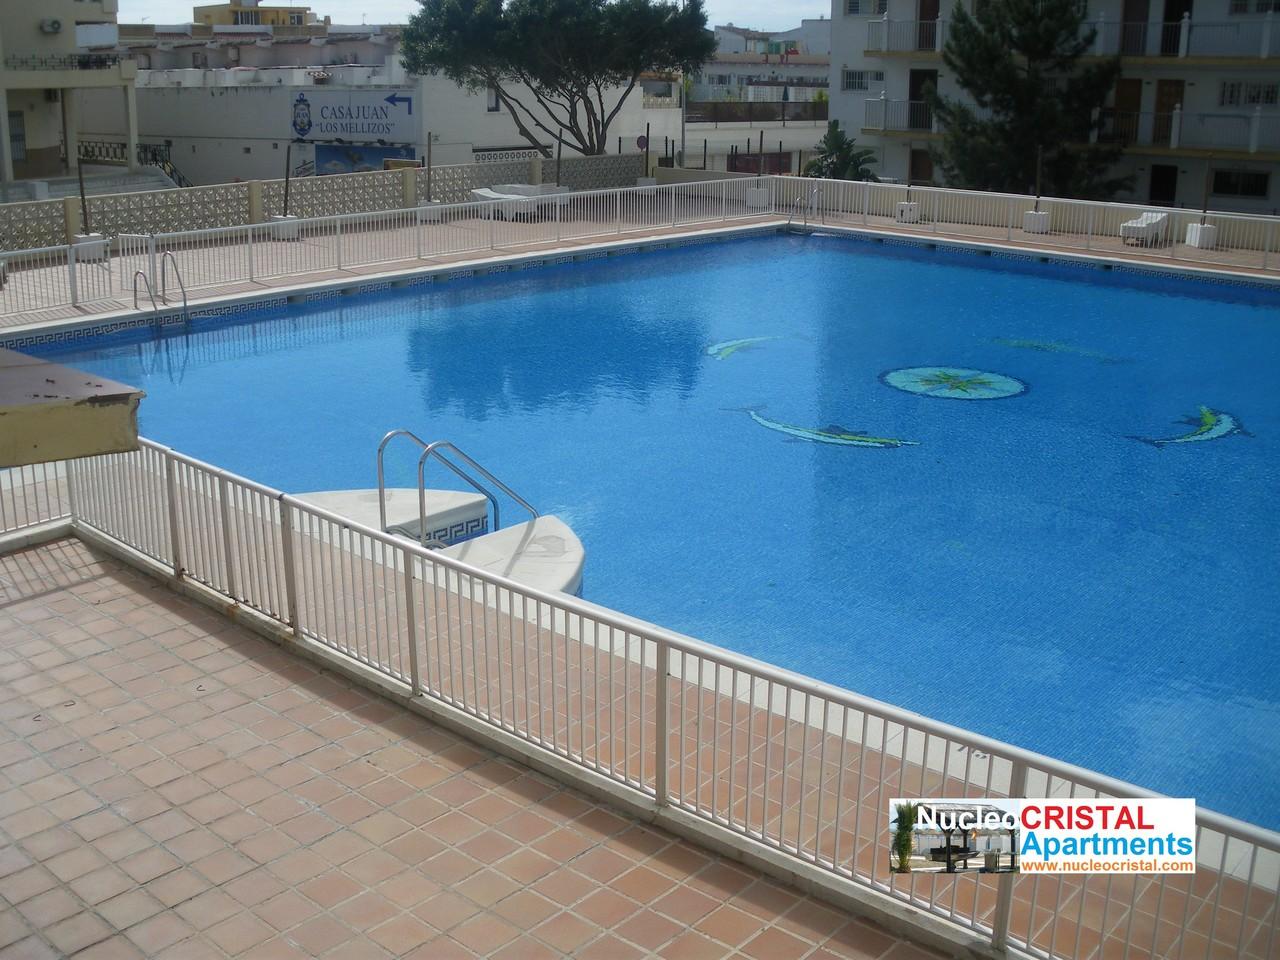 Piscina pool piscine poel torremolinos web oficial for Piscina torremolinos